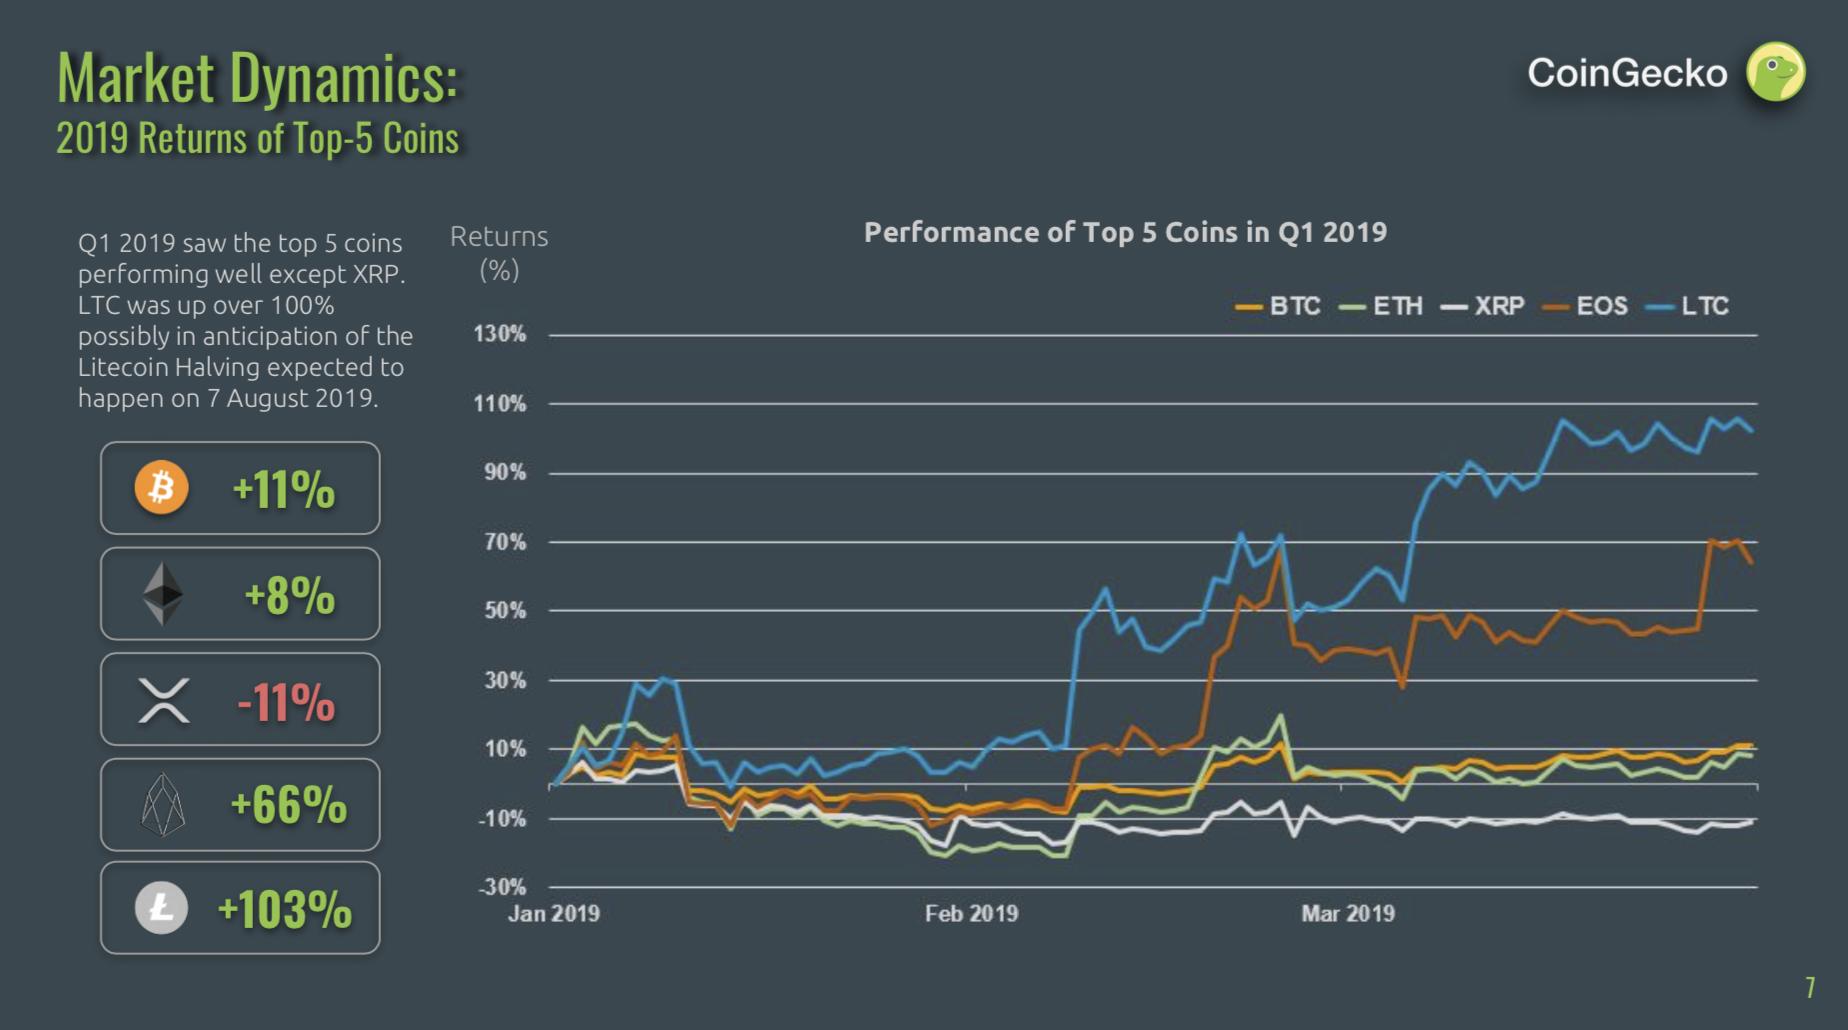 CoinGecko 2019 Q1 Market Dynamic